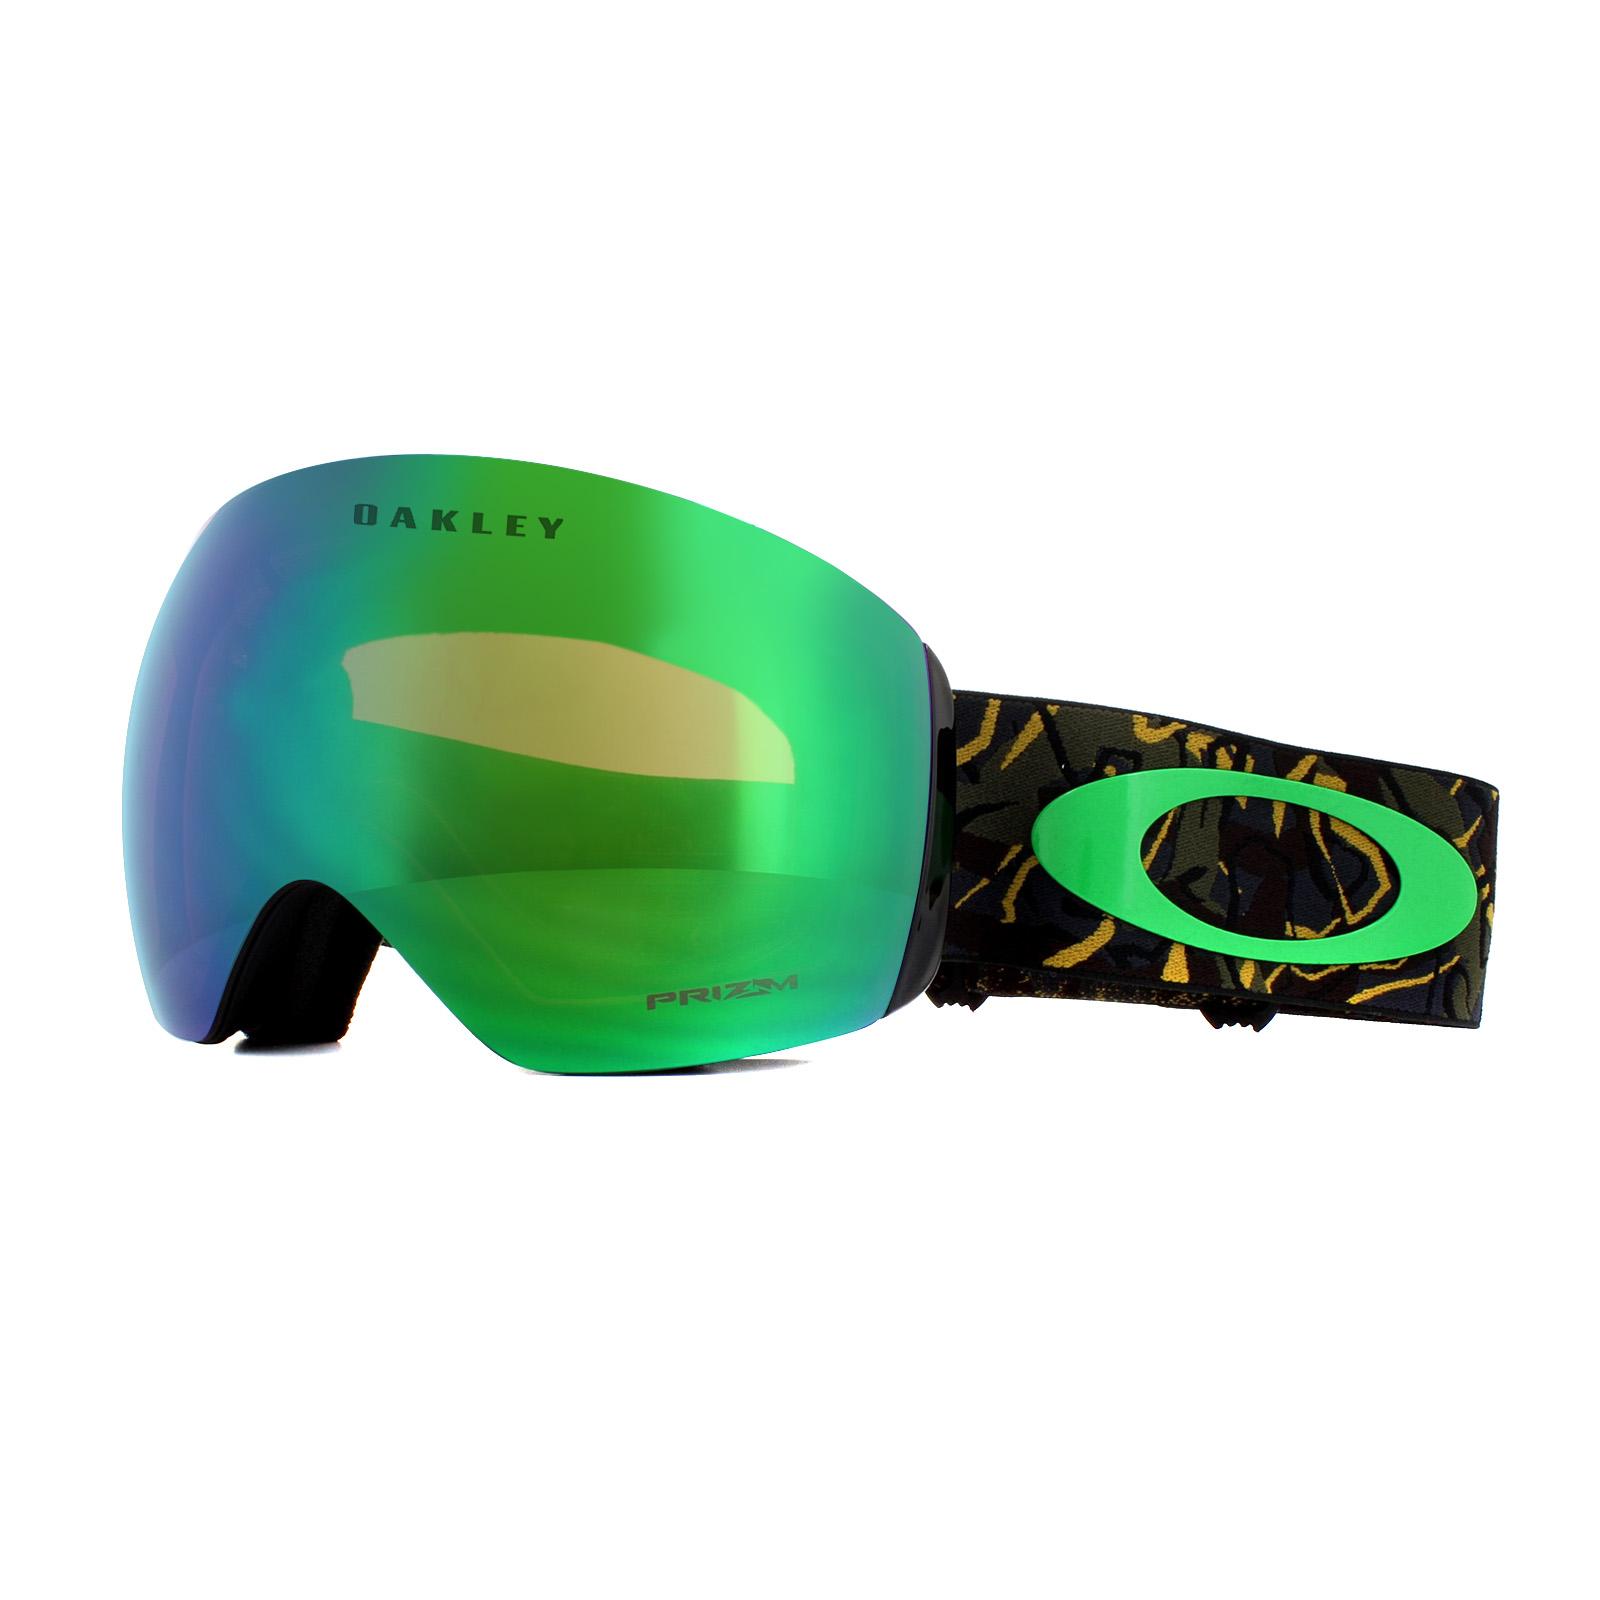 a64fb96064b Sentinel Oakley Ski Goggles Flight Deck OO7050-64 Camo Vine Jungle Prizm  Jade Iridium